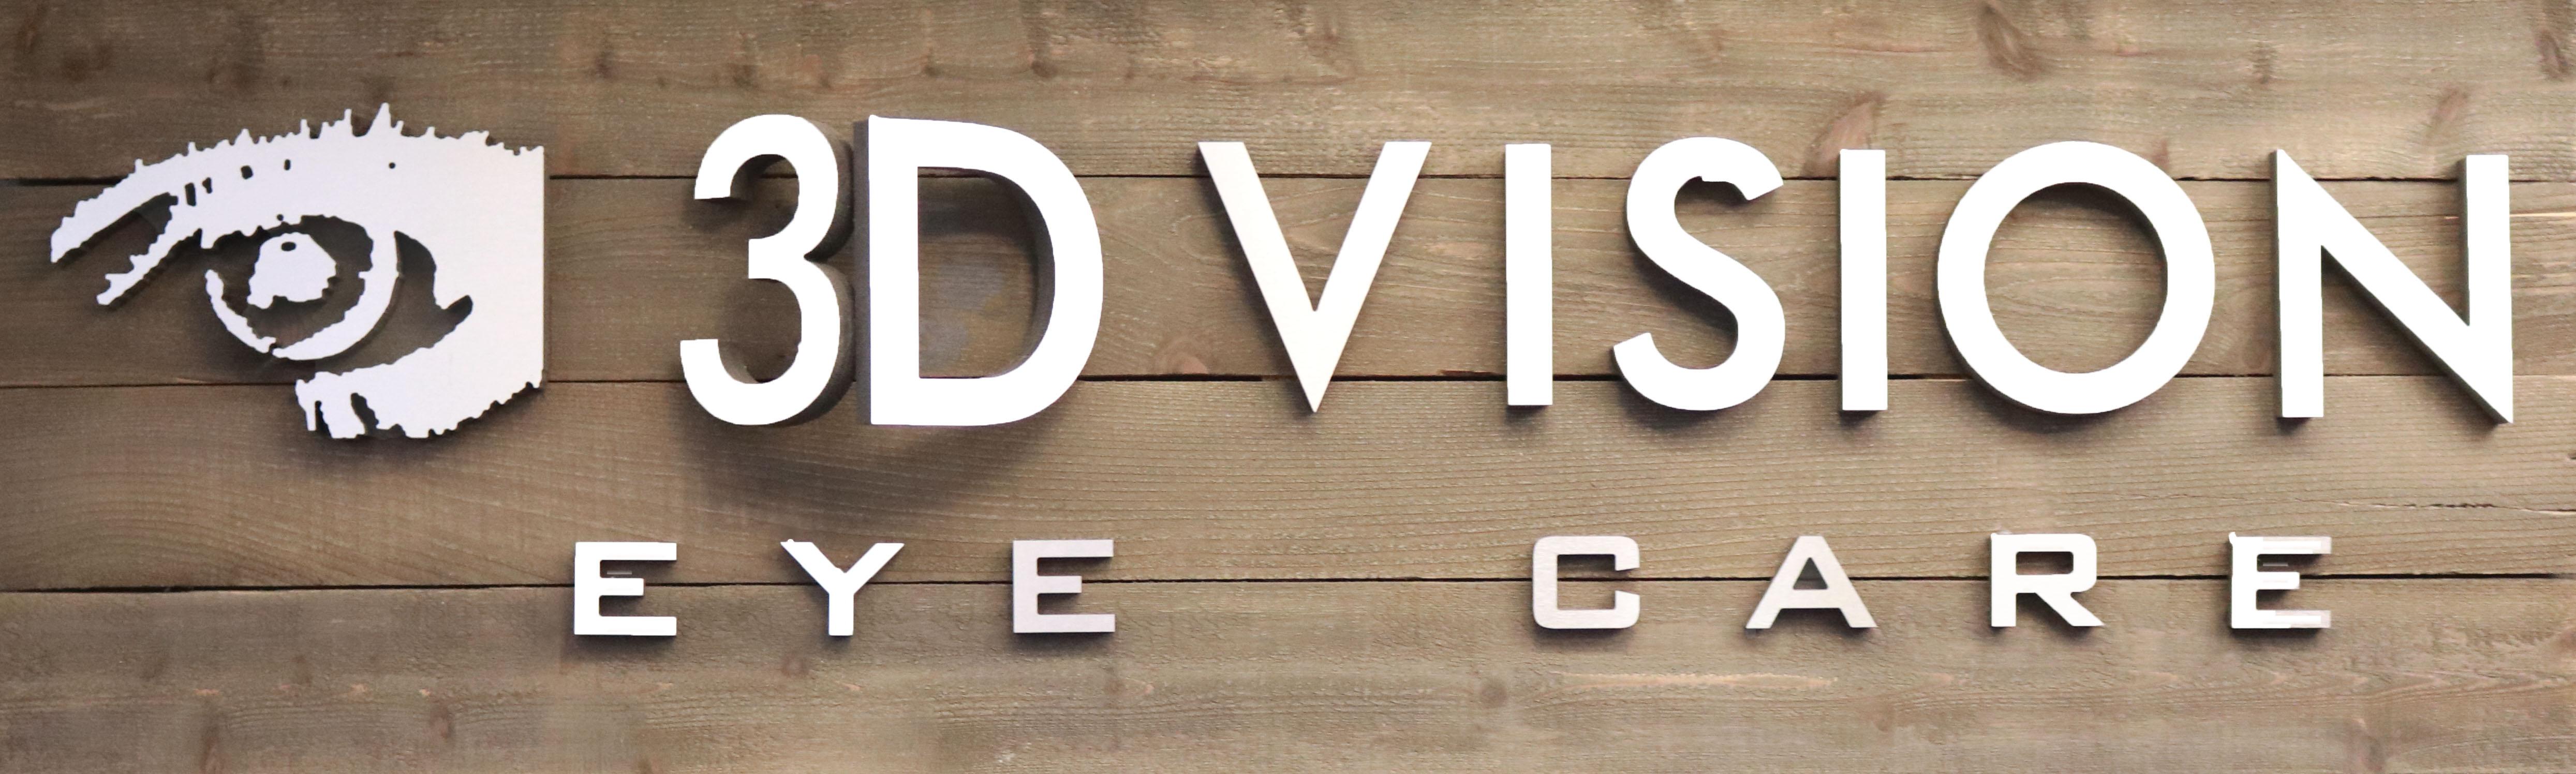 3D Vision Eye Care Logo